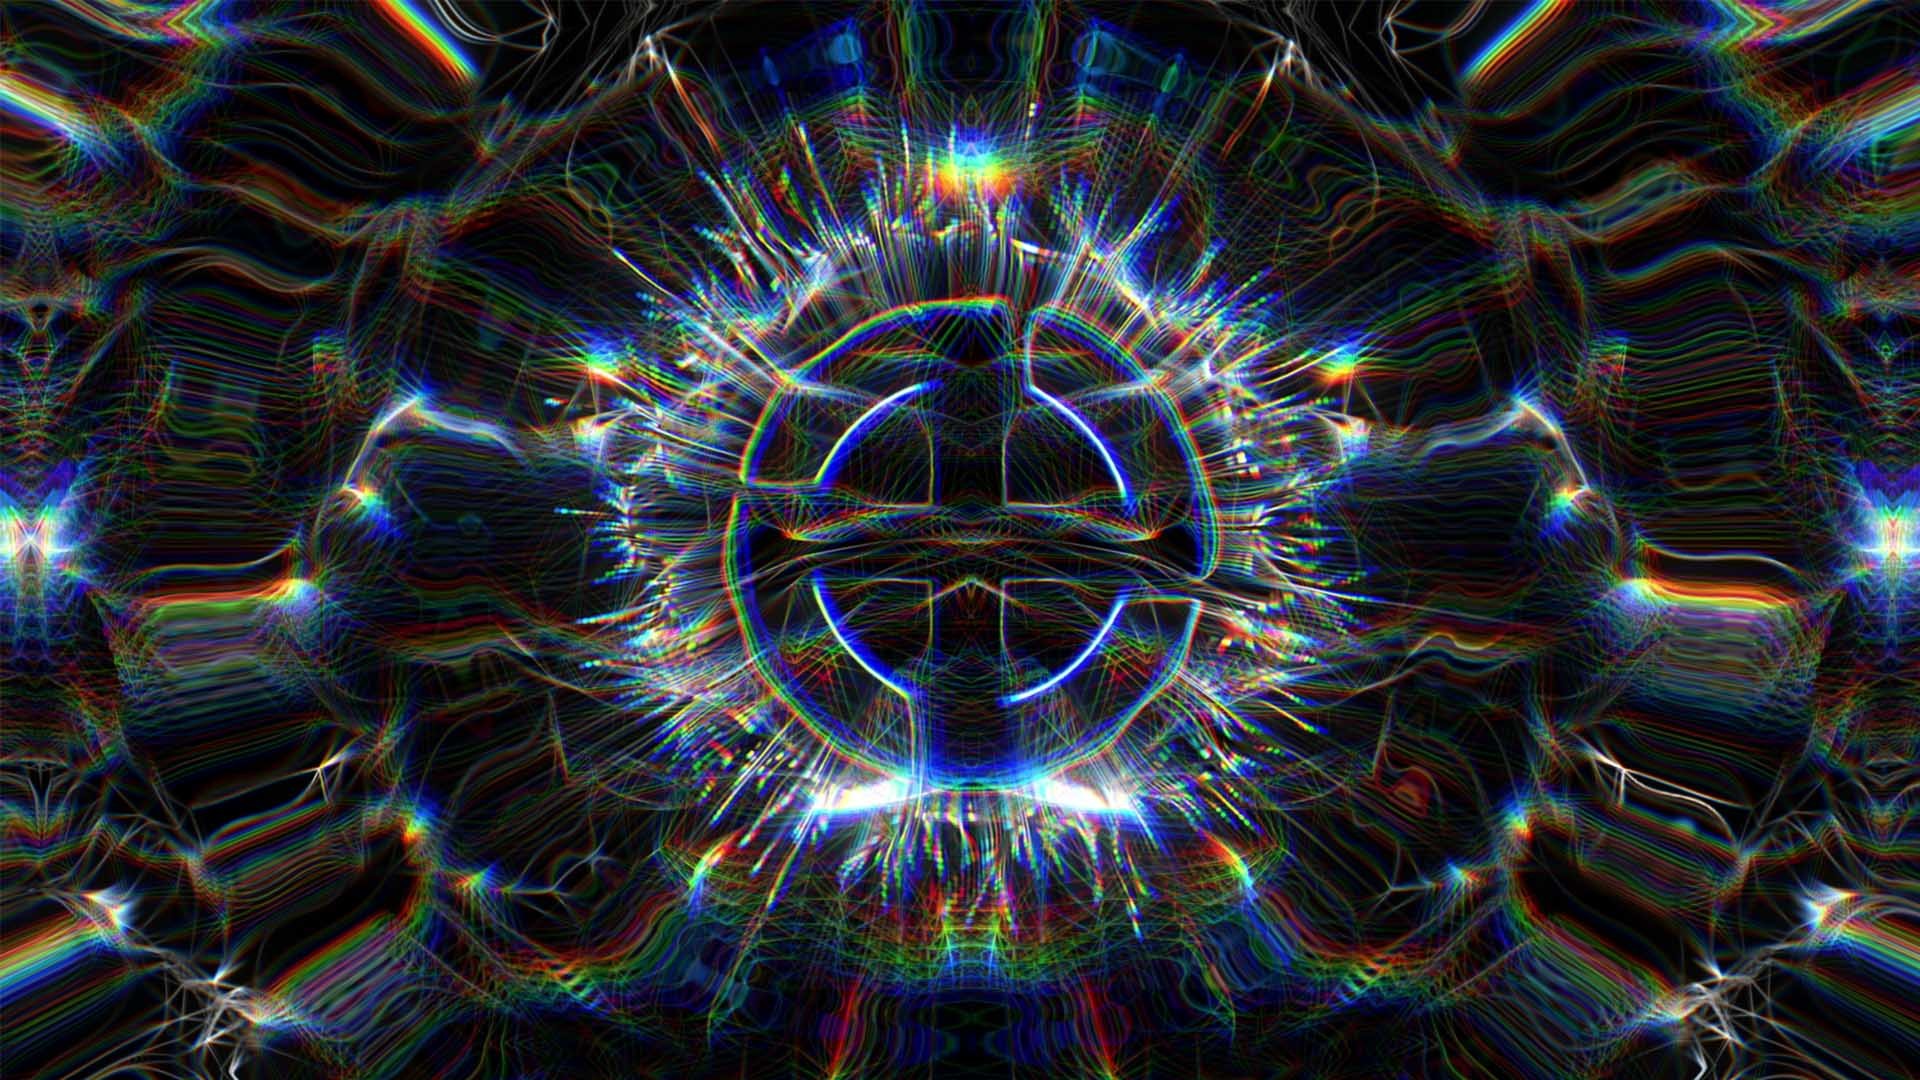 Occult_Motion_Background_Video_Art_Vj_Loop_HD